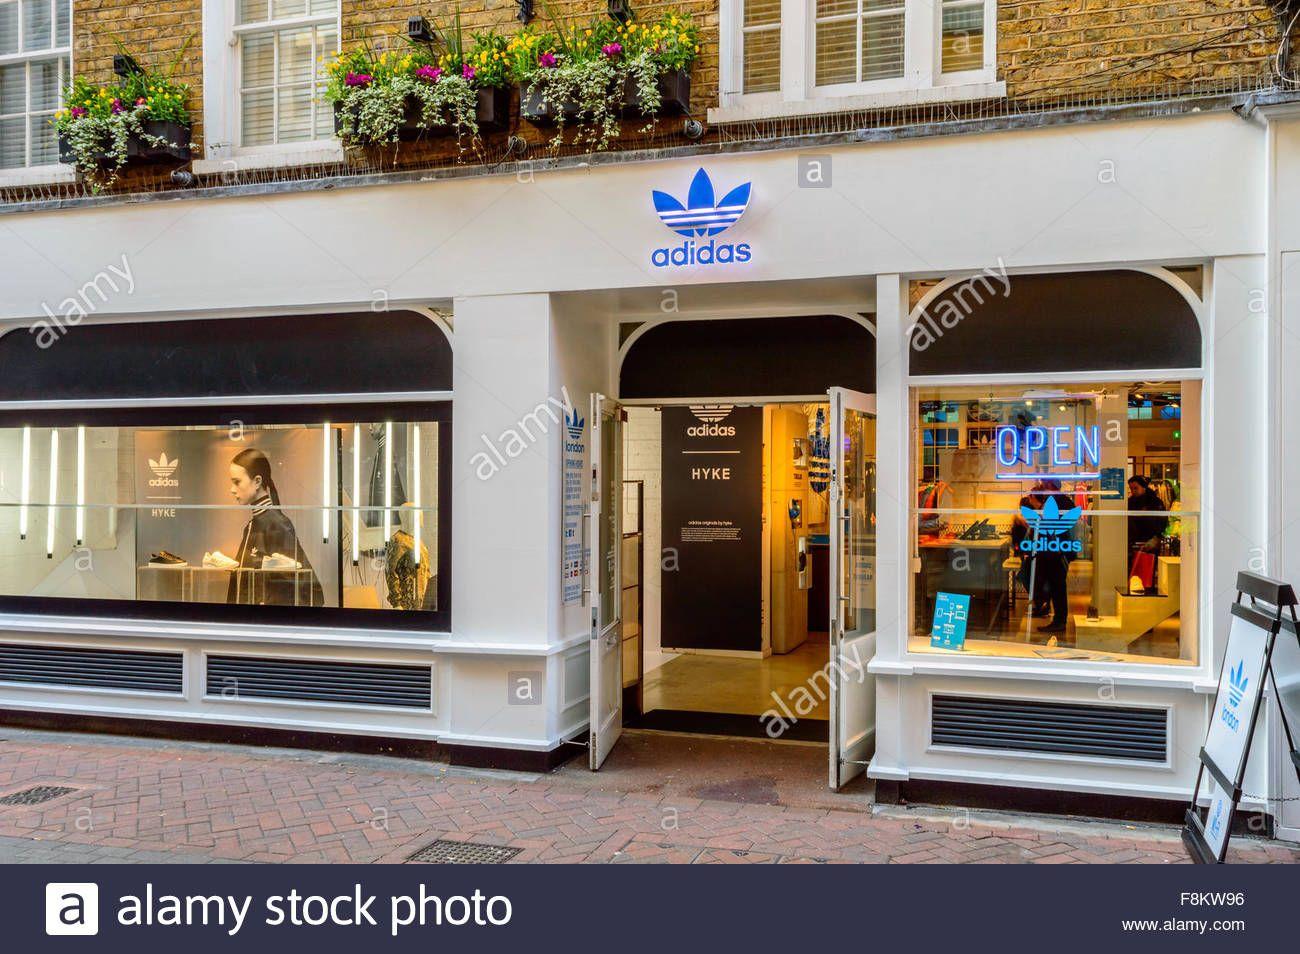 Adidas Originals London store